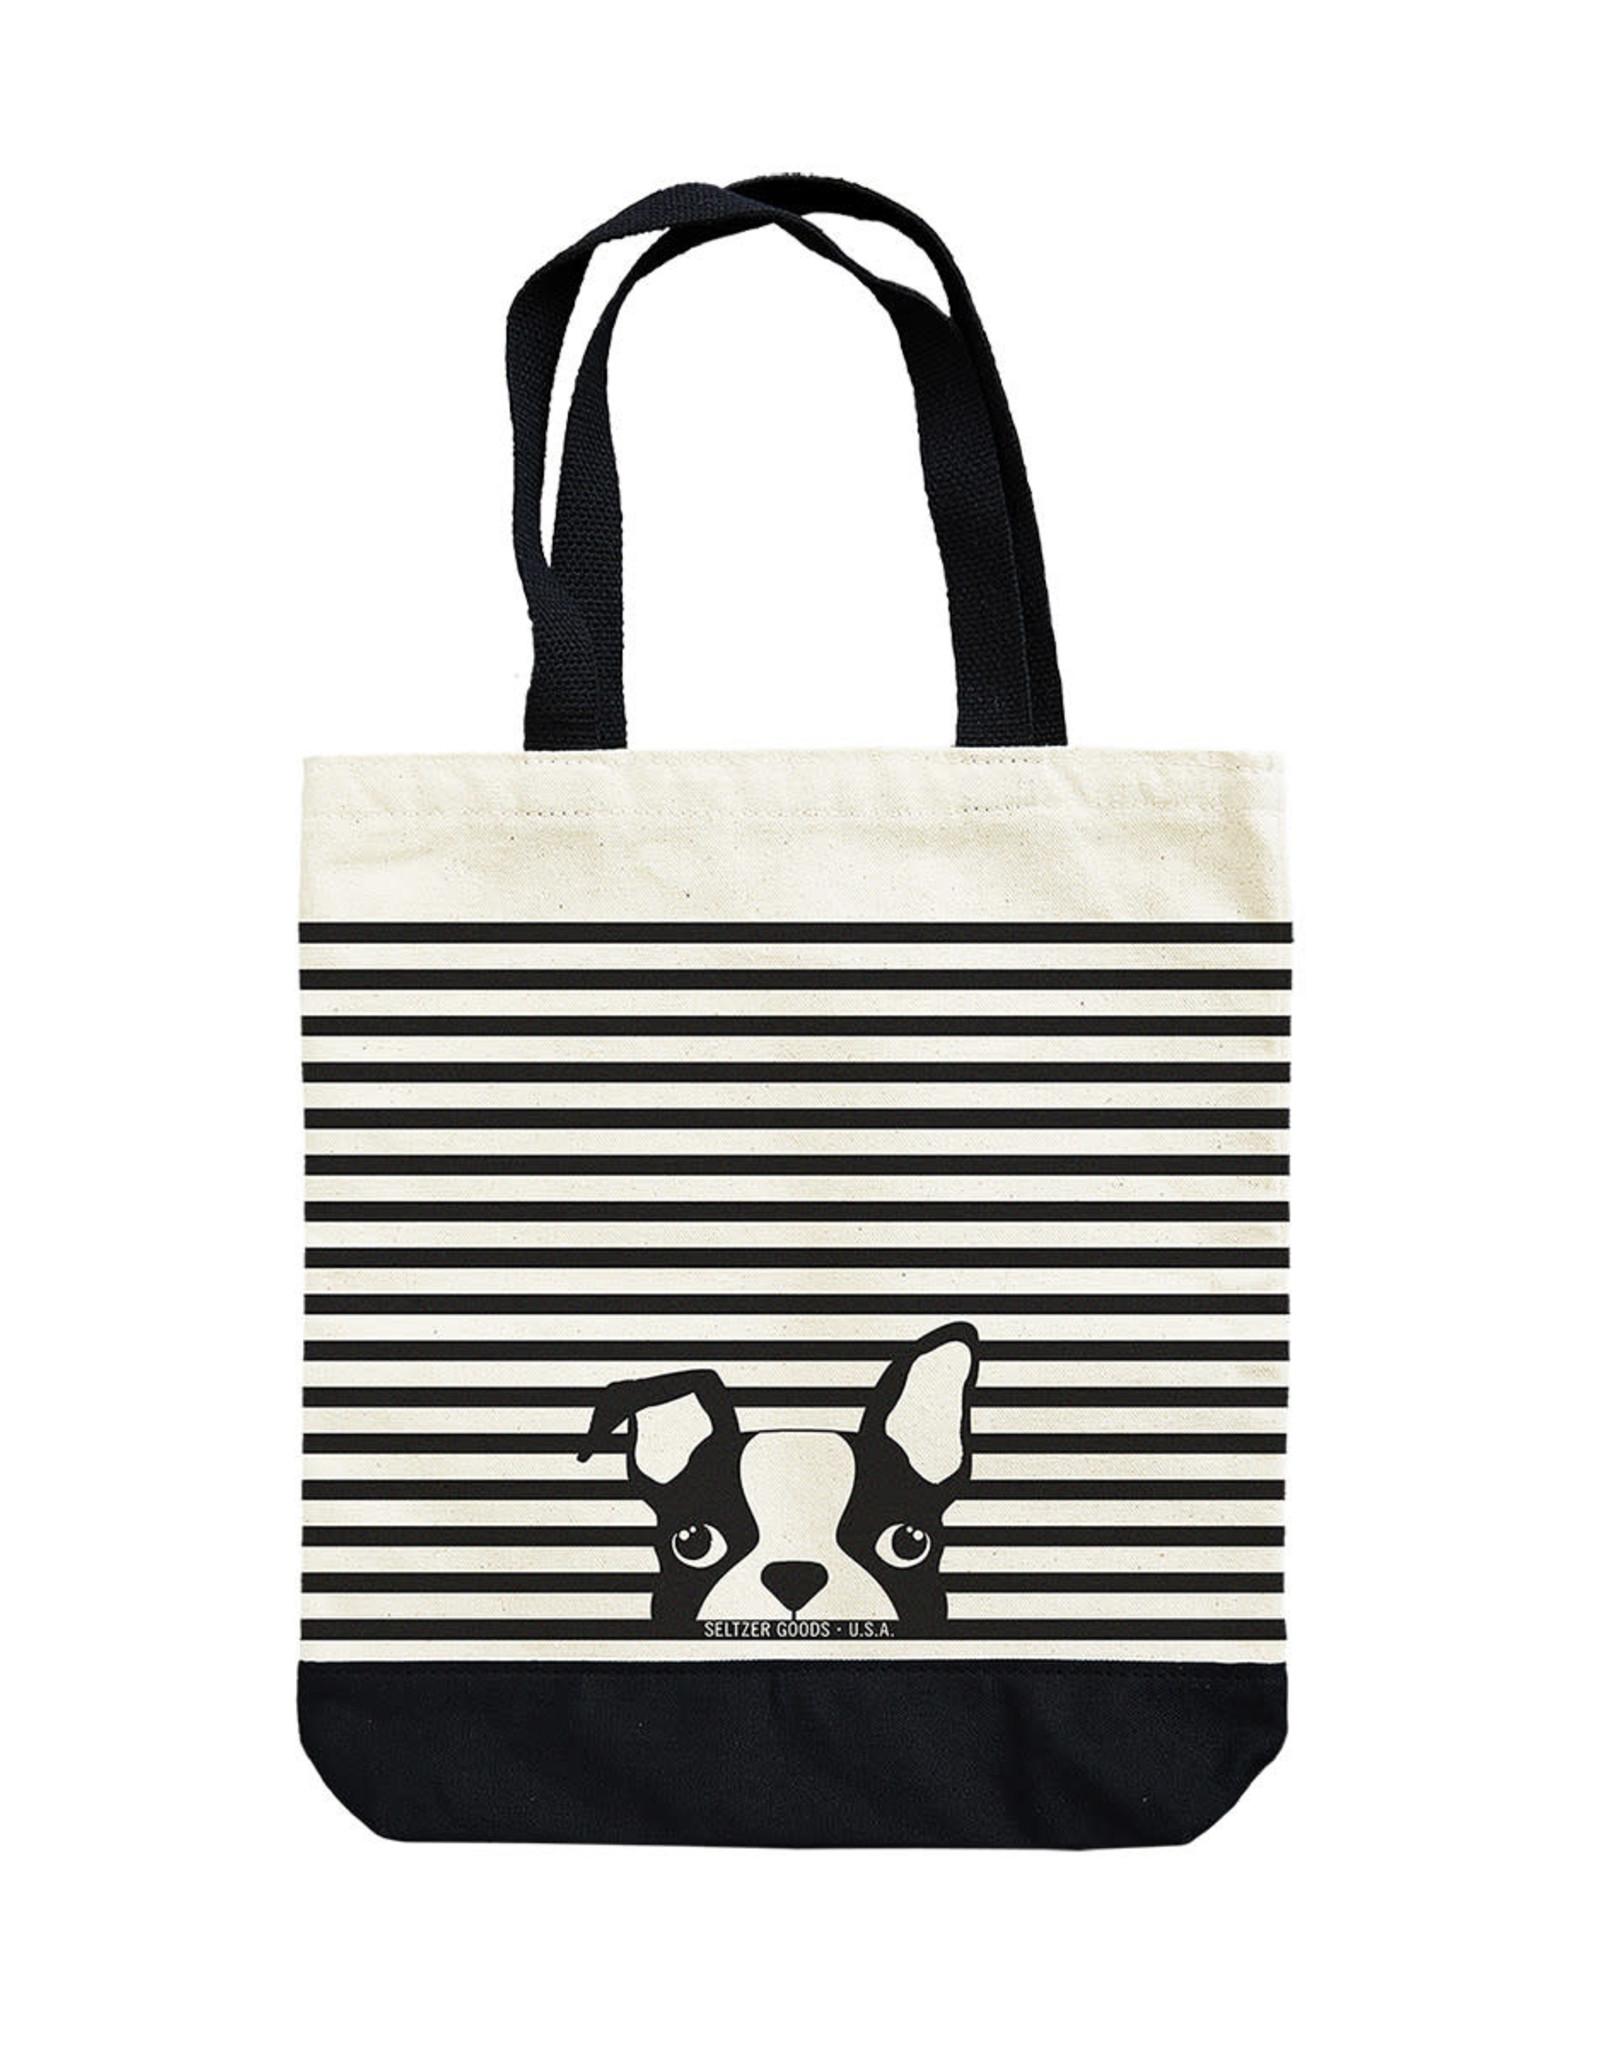 Seltzer Dog Stripes Tote Bag - Seltzer